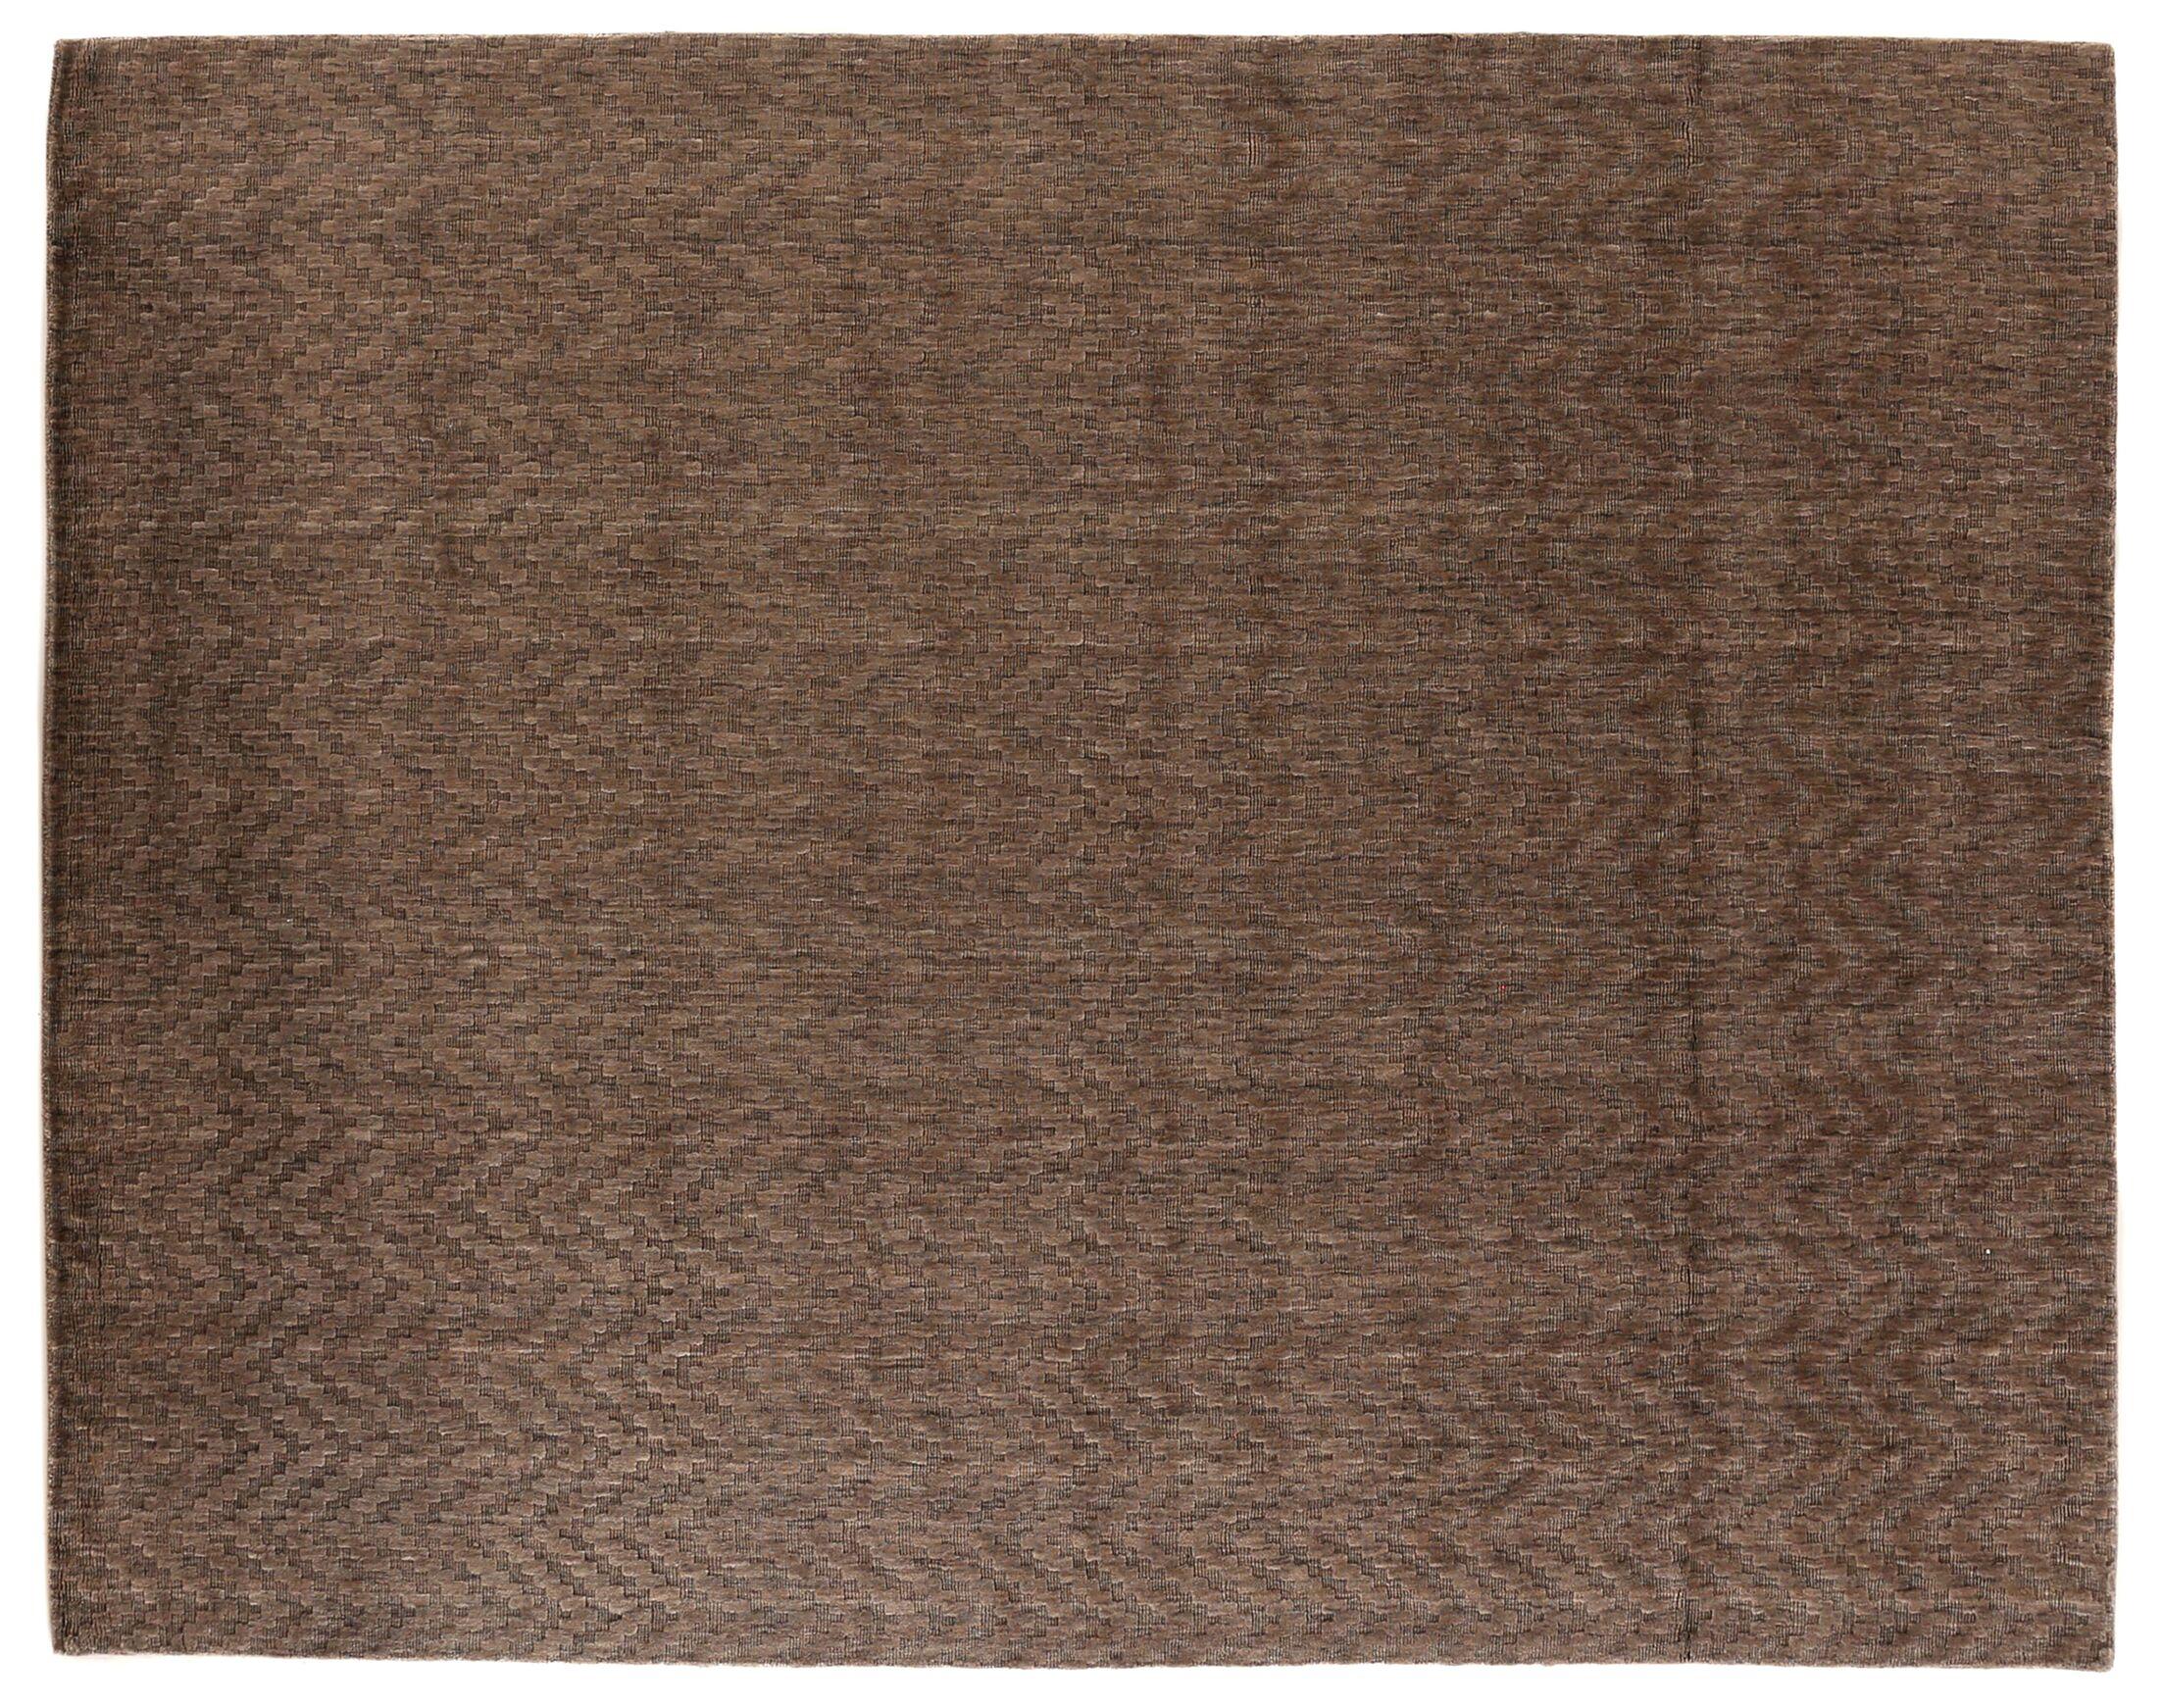 Demani Hand-Woven Wool Brown Area Rug Rug Size: Rectangle 12' x 15'